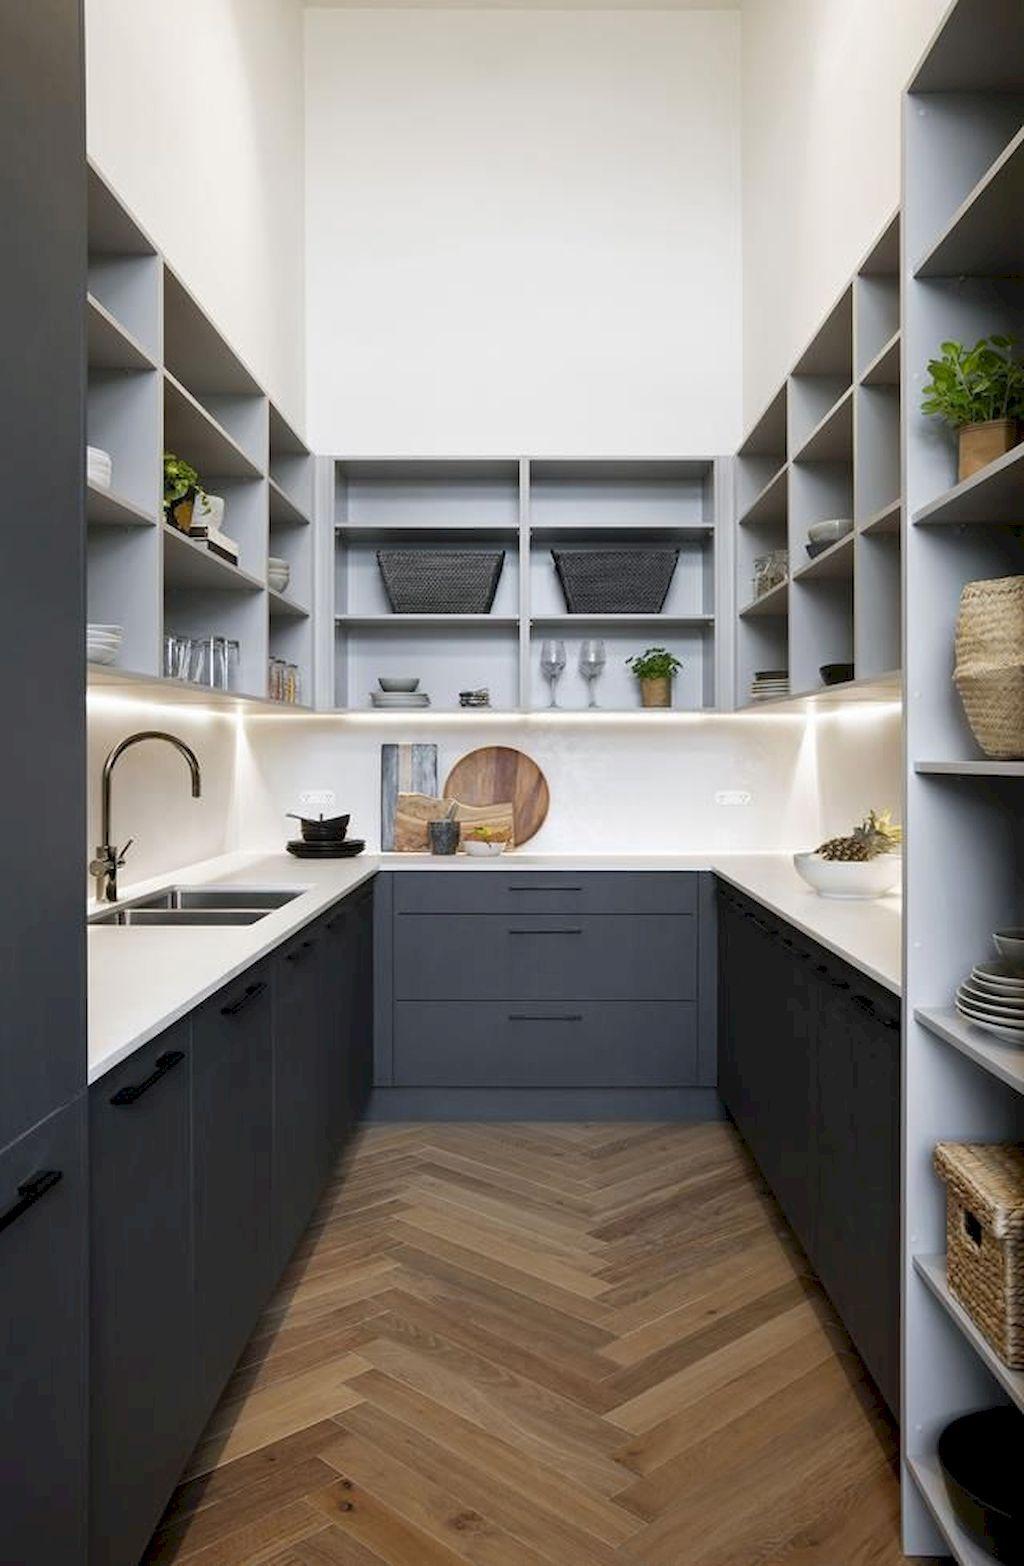 55 Practical Pantry Storages Ideas Kitchen pantry design